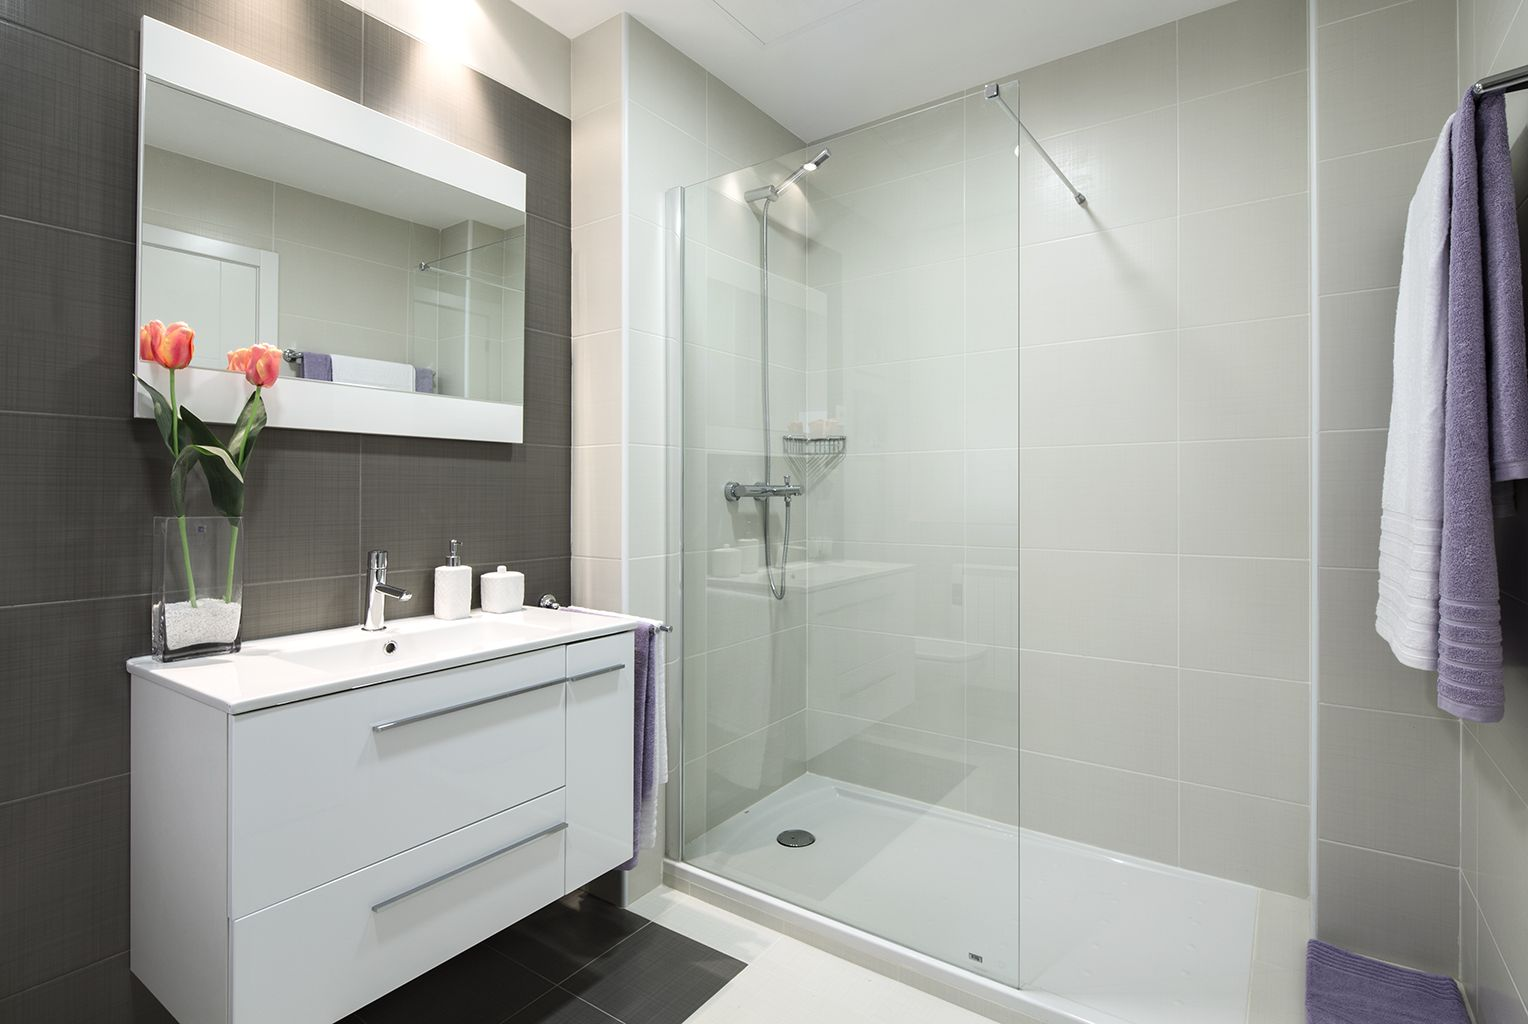 Cuarto de baño | Interior | Pinterest | Cuarto de baño, Baño con ...